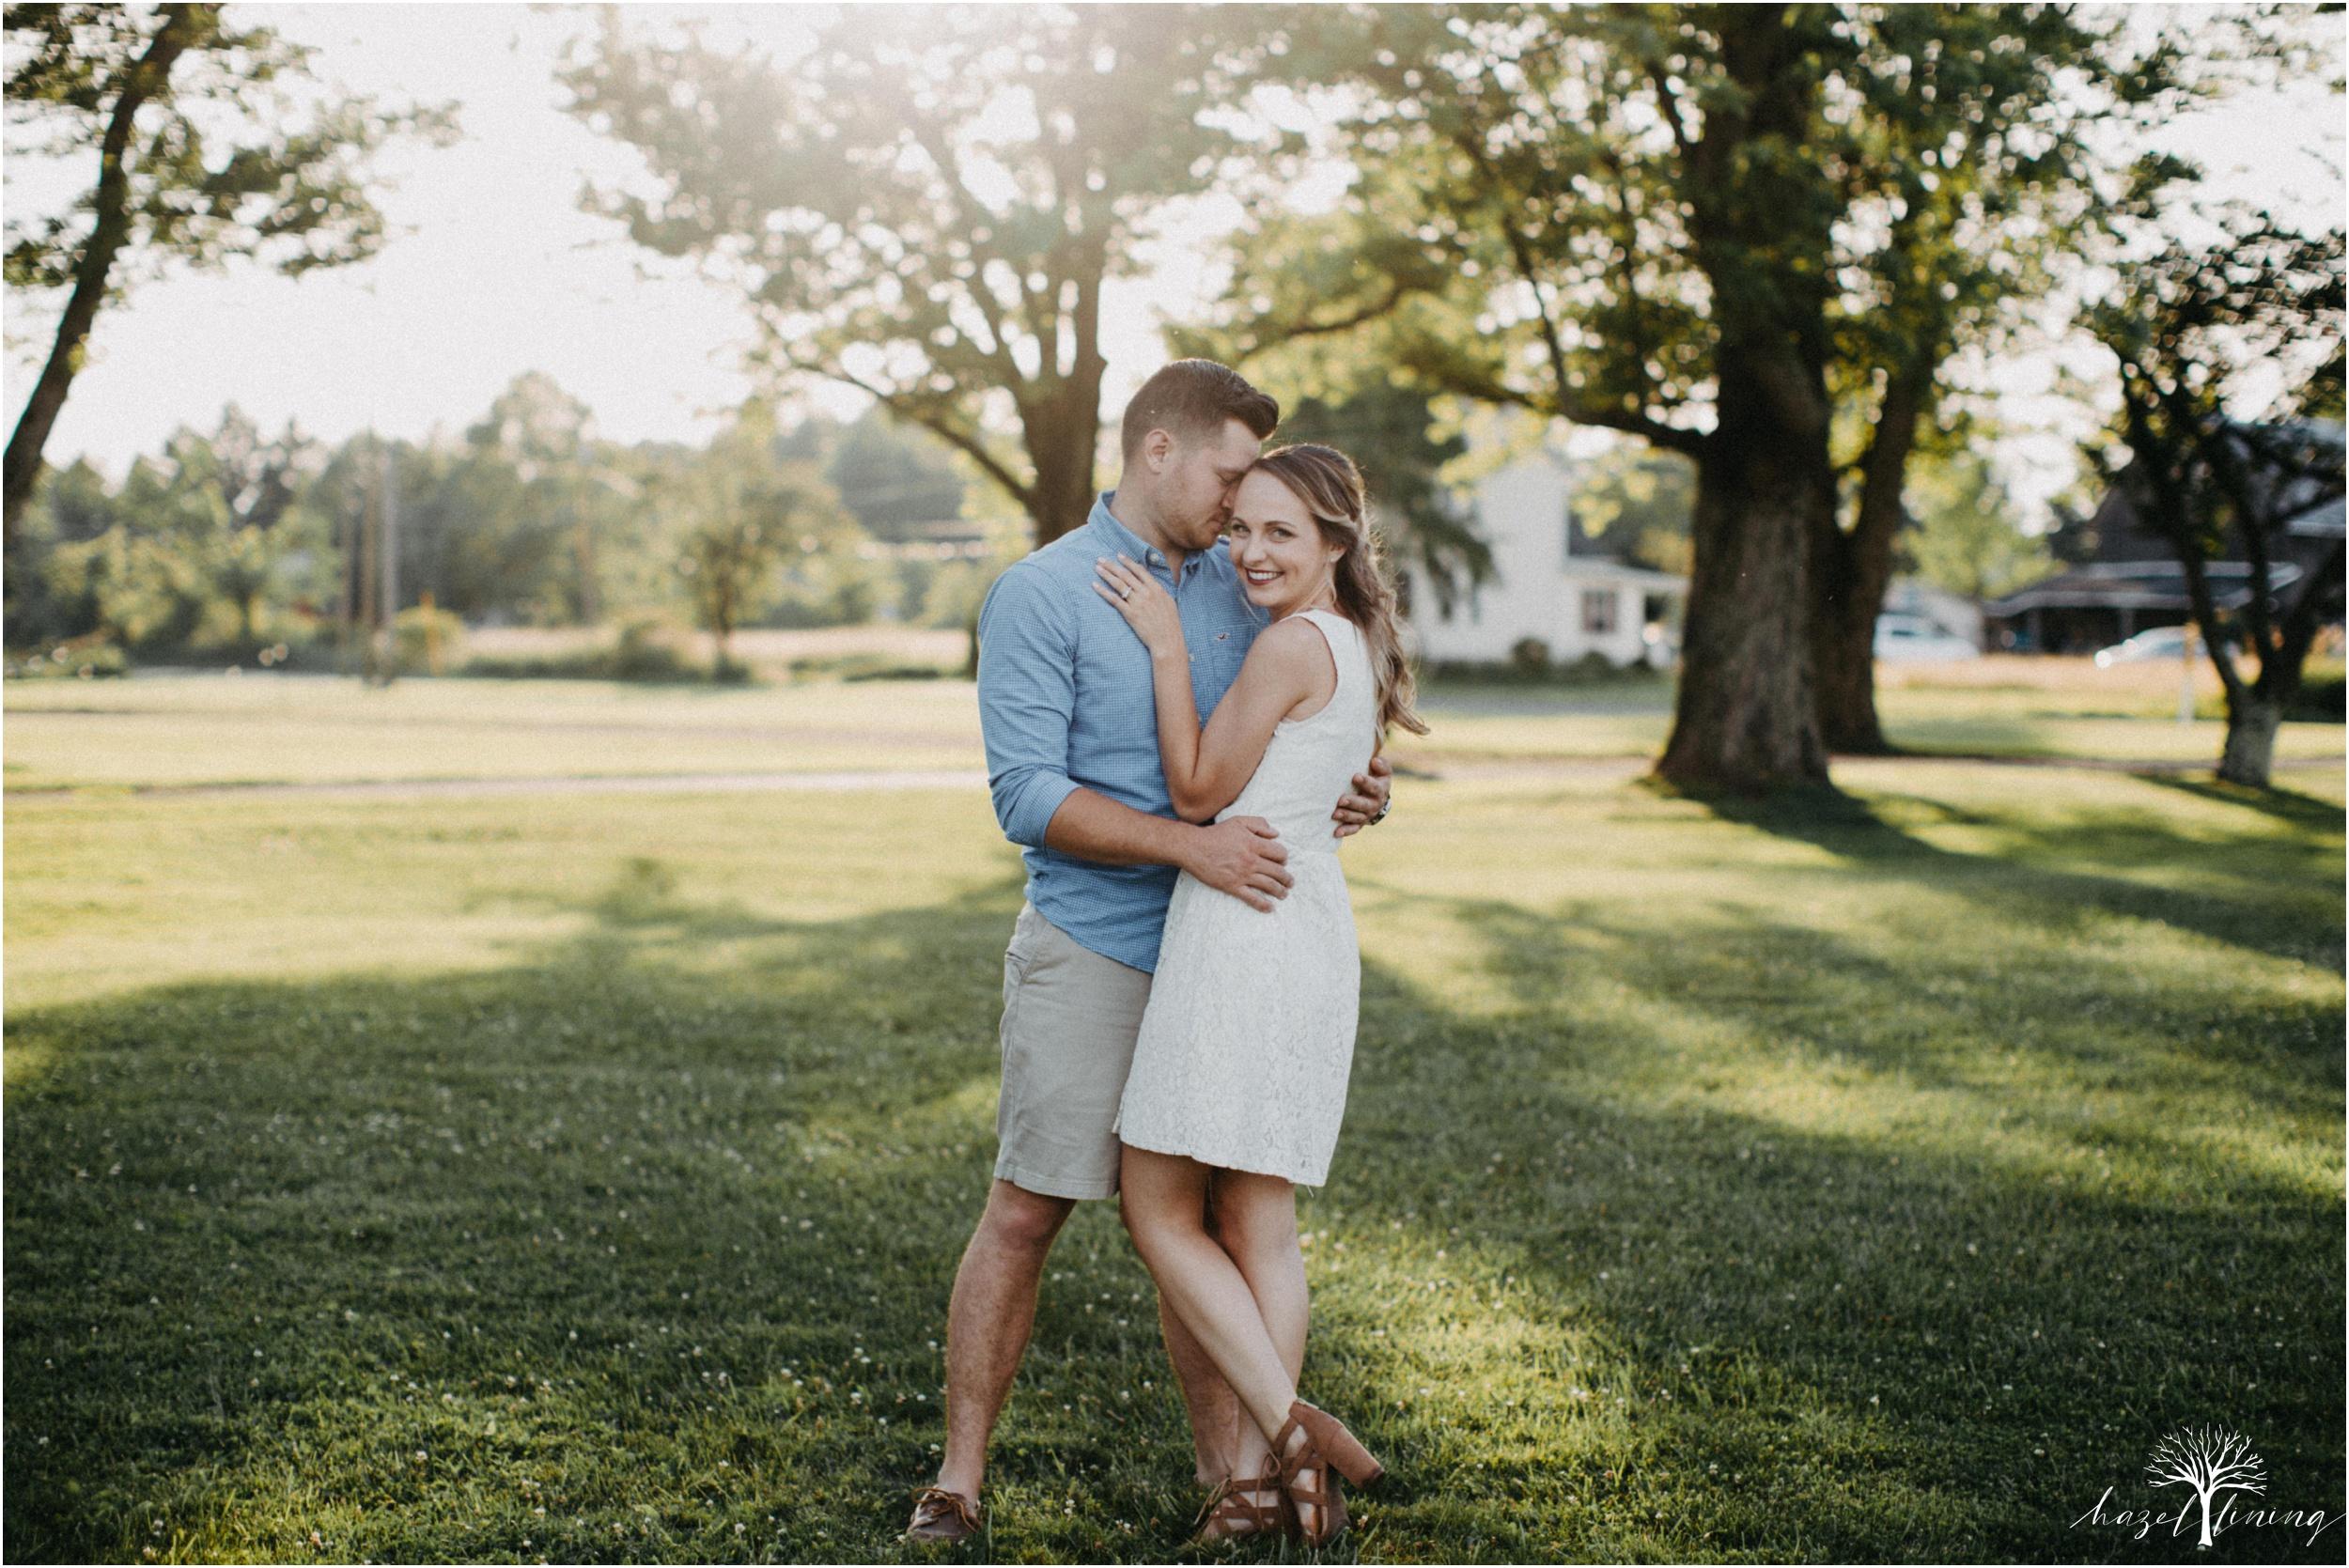 rachel-warner-chris-niedrist-the-farm-bakery-and-events-quakertown-pa-summer-engagement-hazel-lining-photography-destination-elopement-wedding-engagement-photography_0007.jpg